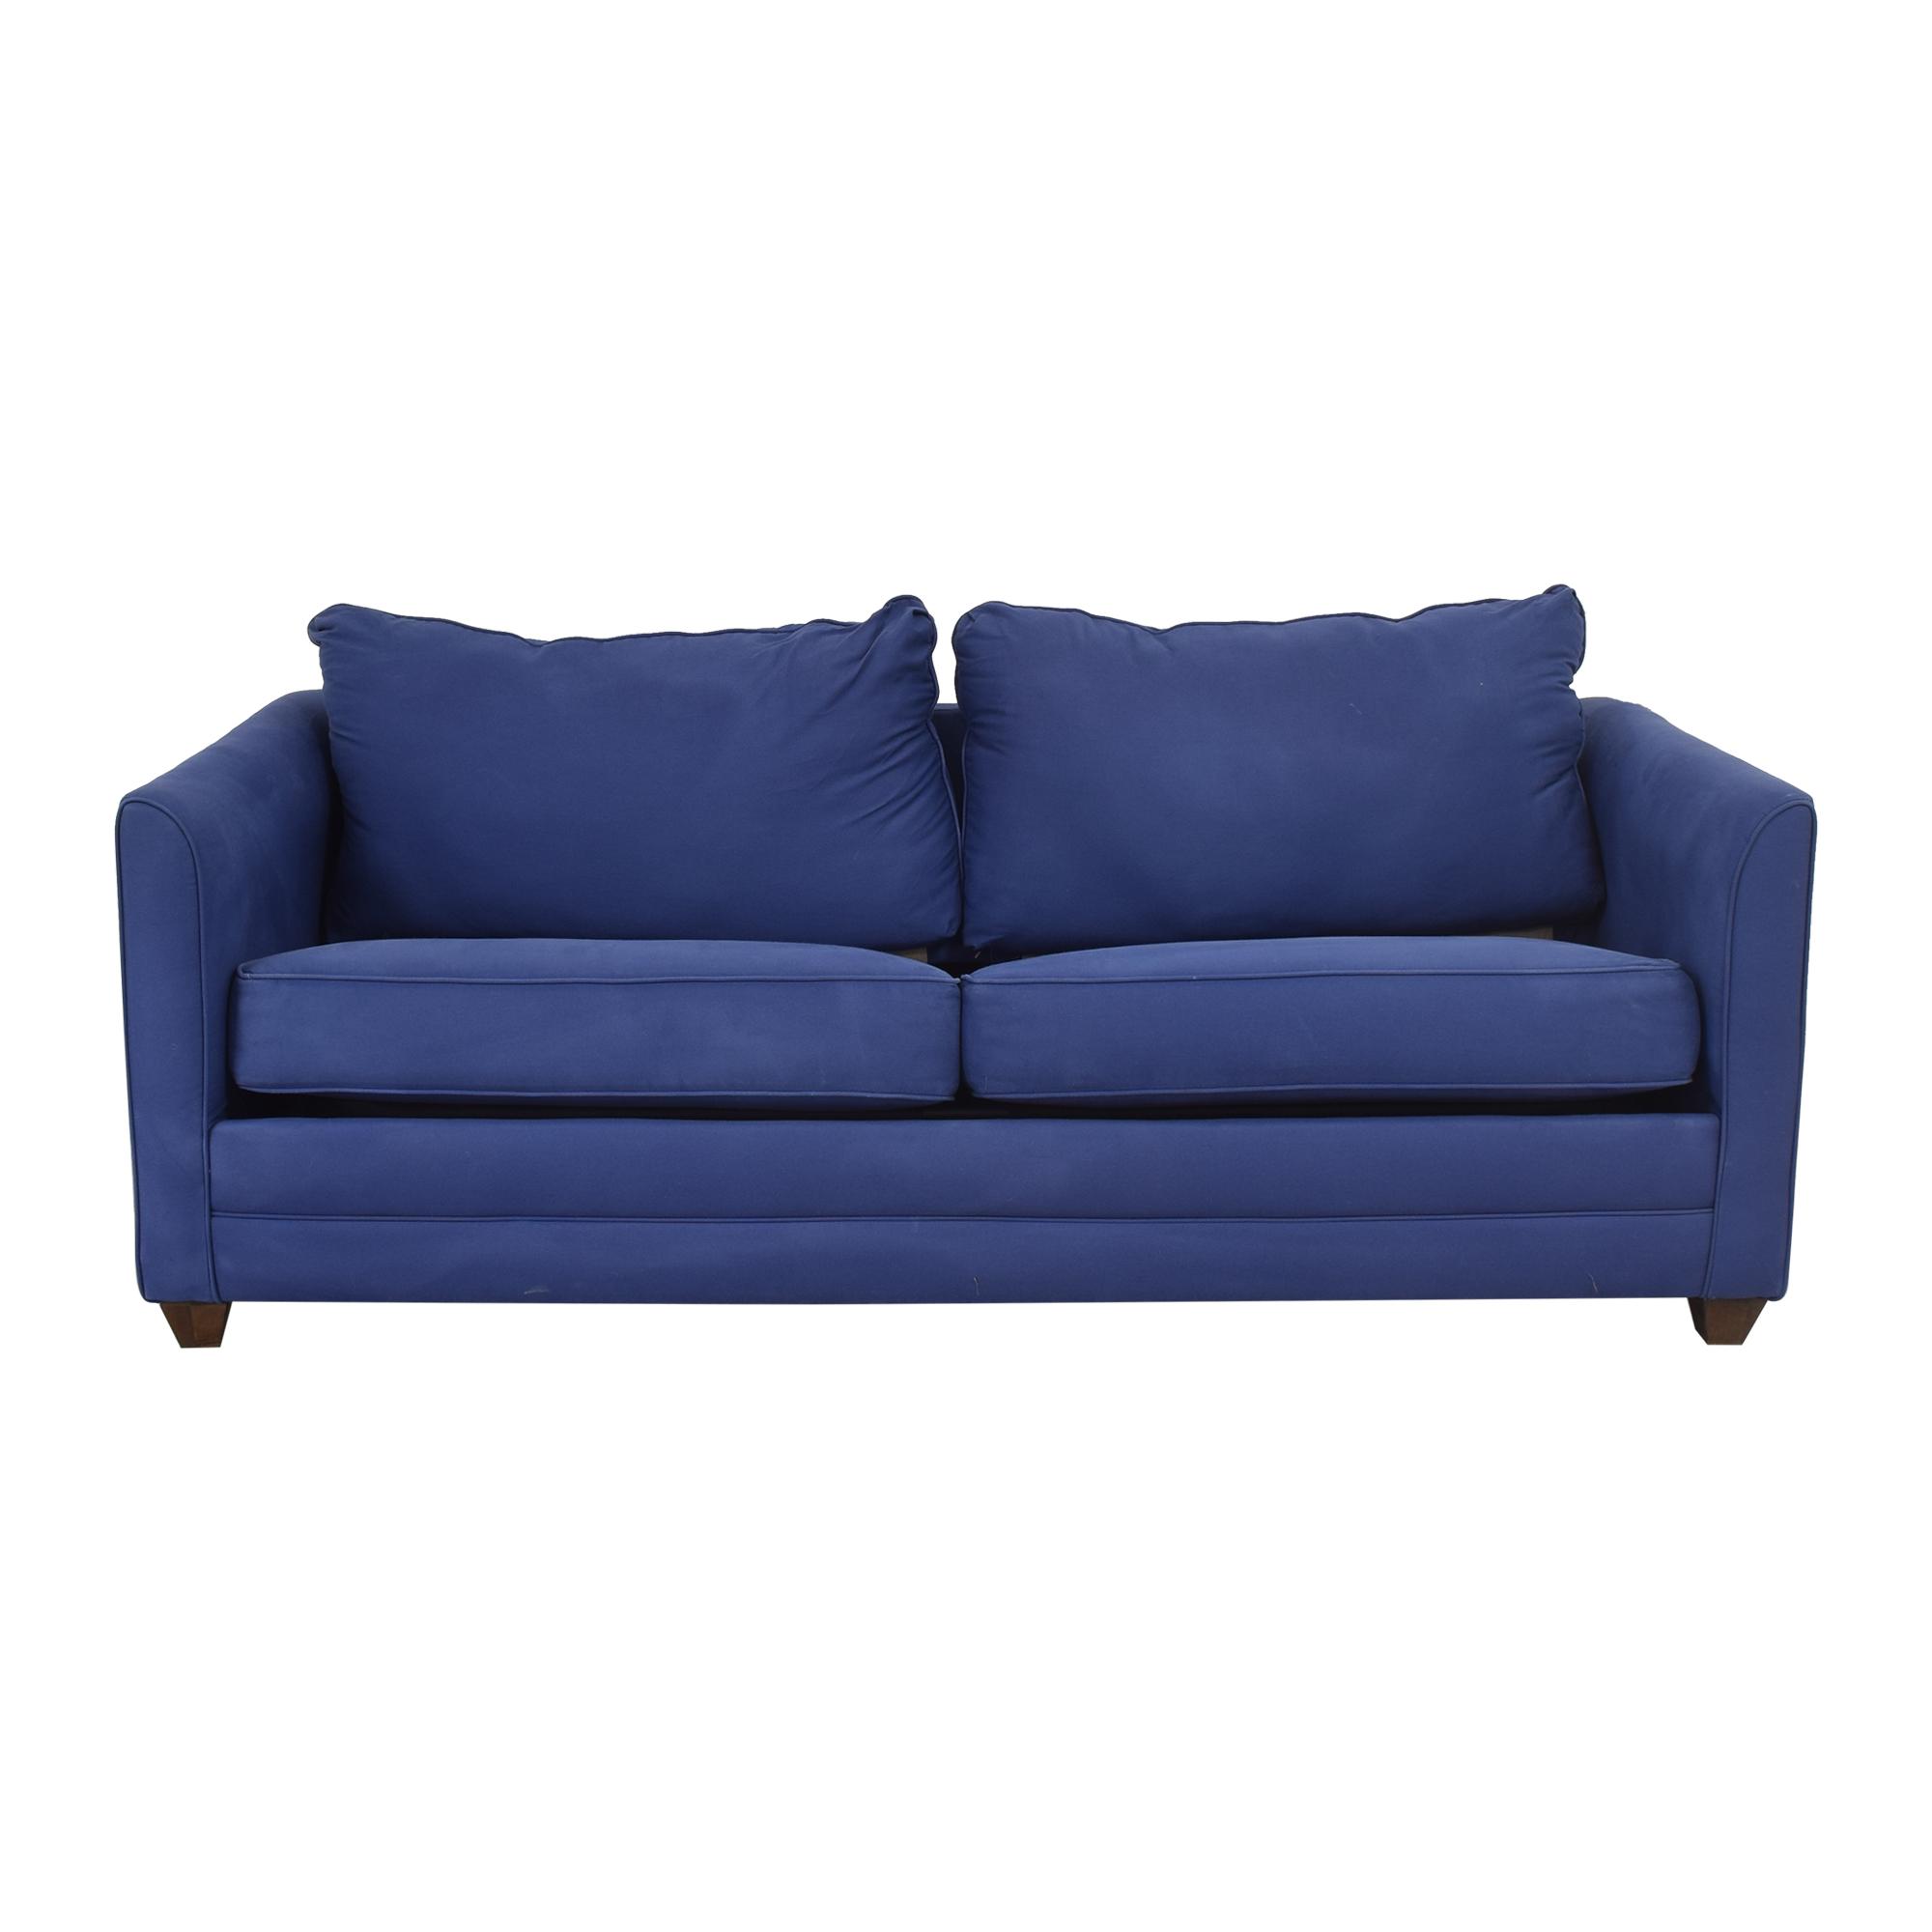 Wayfair Wayfair Custom Upholstery Sarah Sofa Bed nj